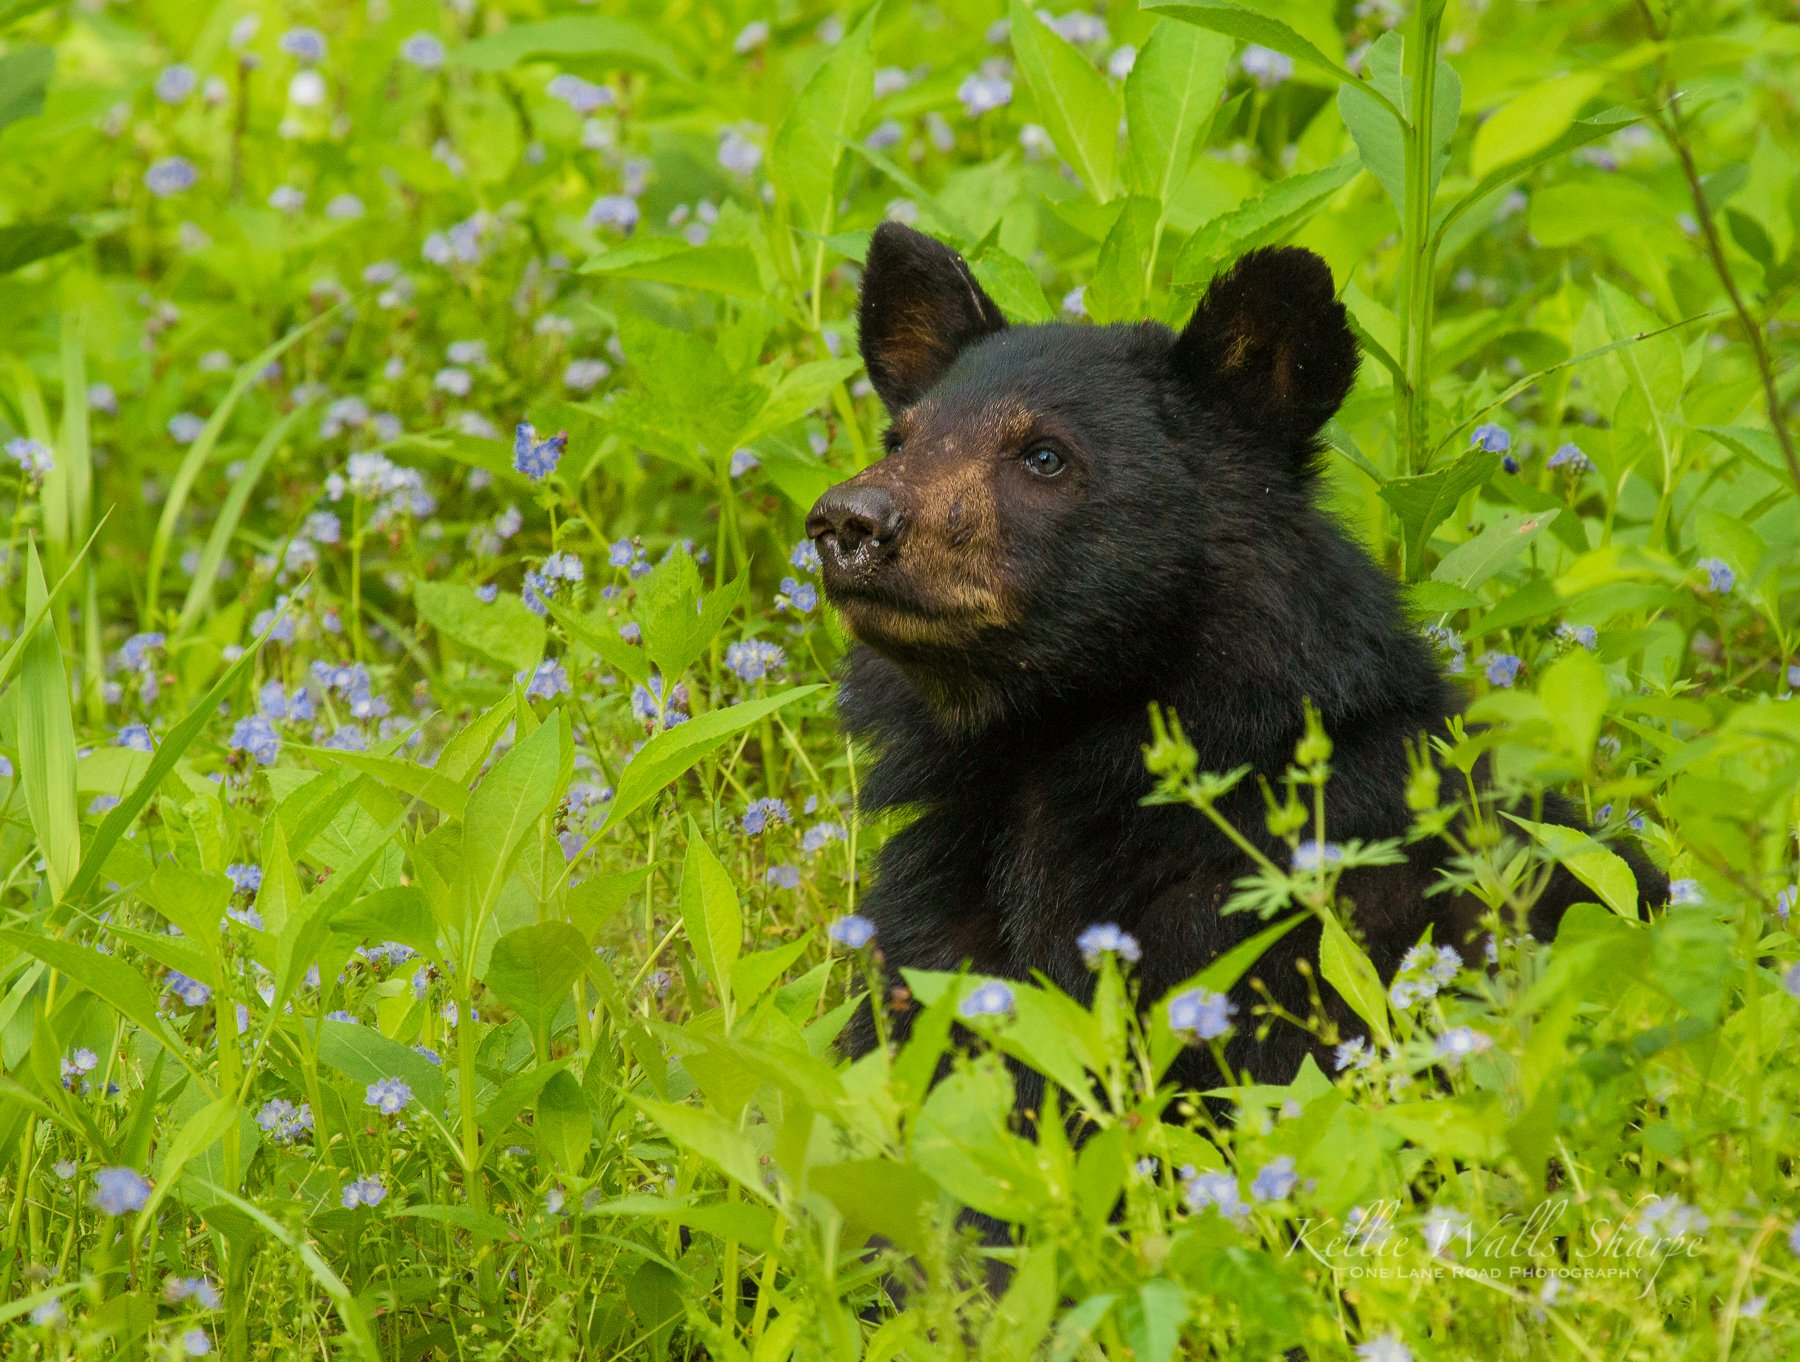 wildlife_photography_17.jpg